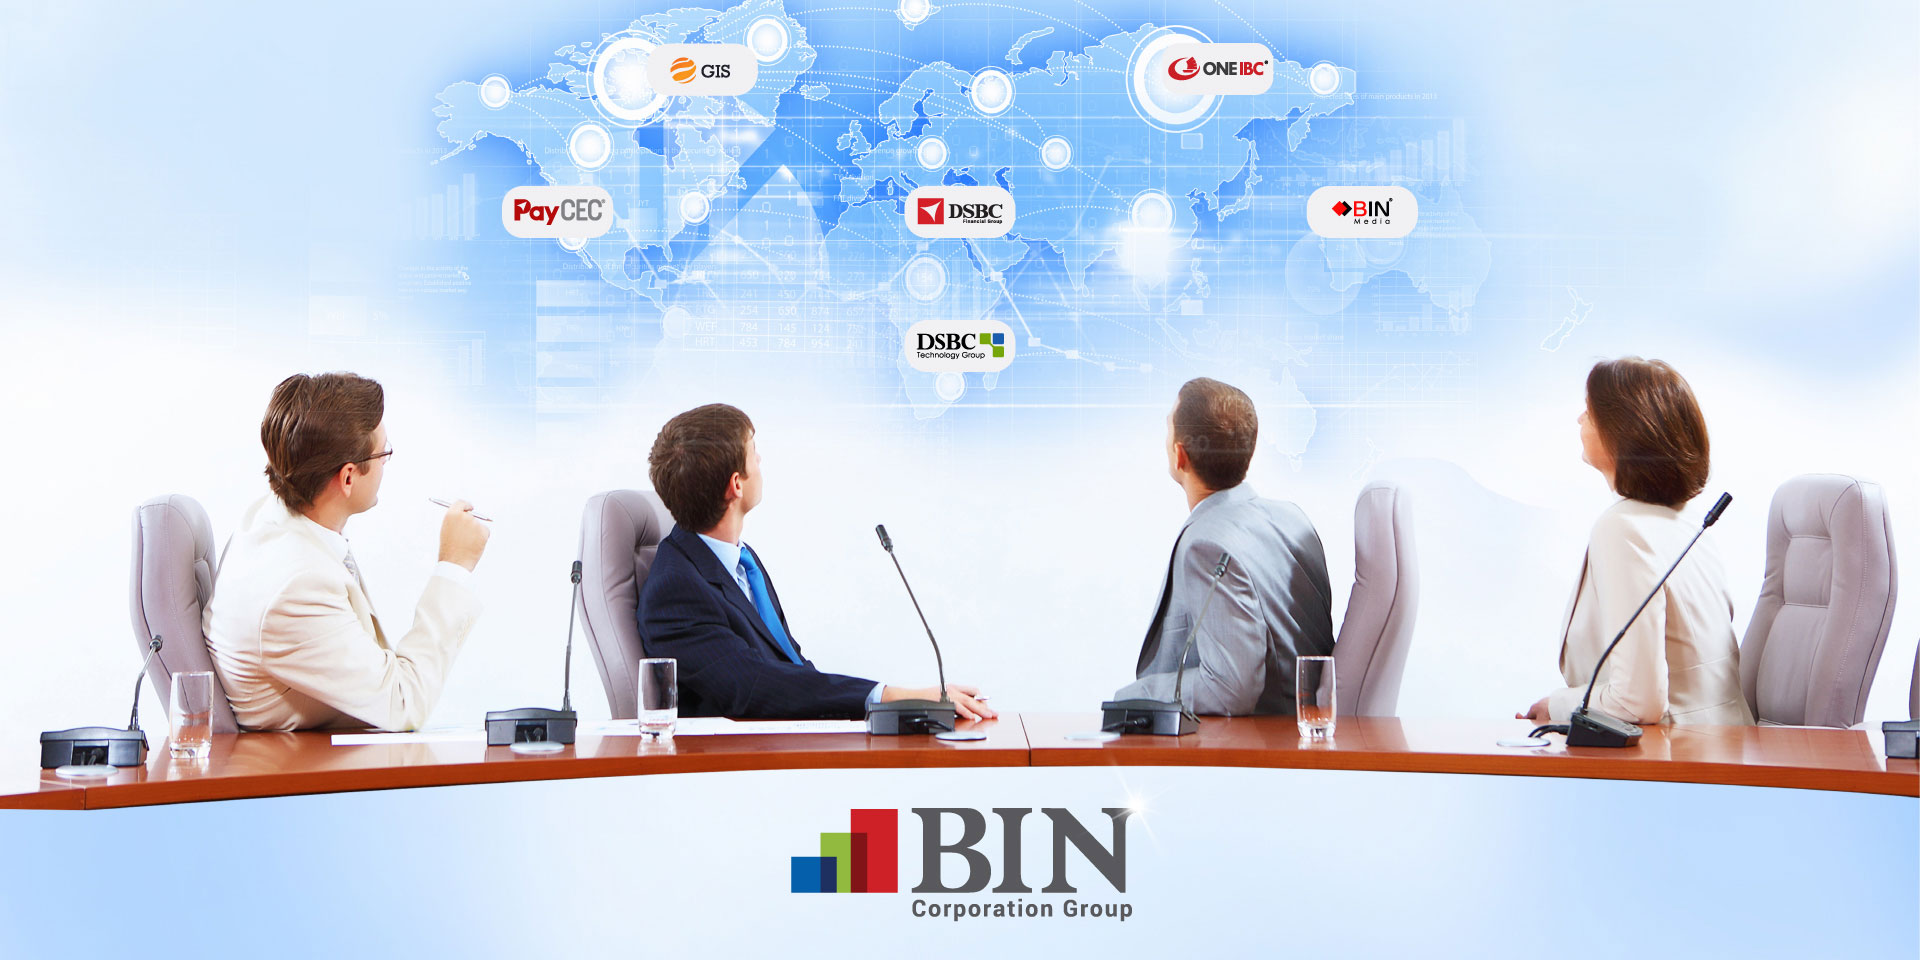 BIN Corporation Group is the impression business metastasis of BIN Holdings Ltd